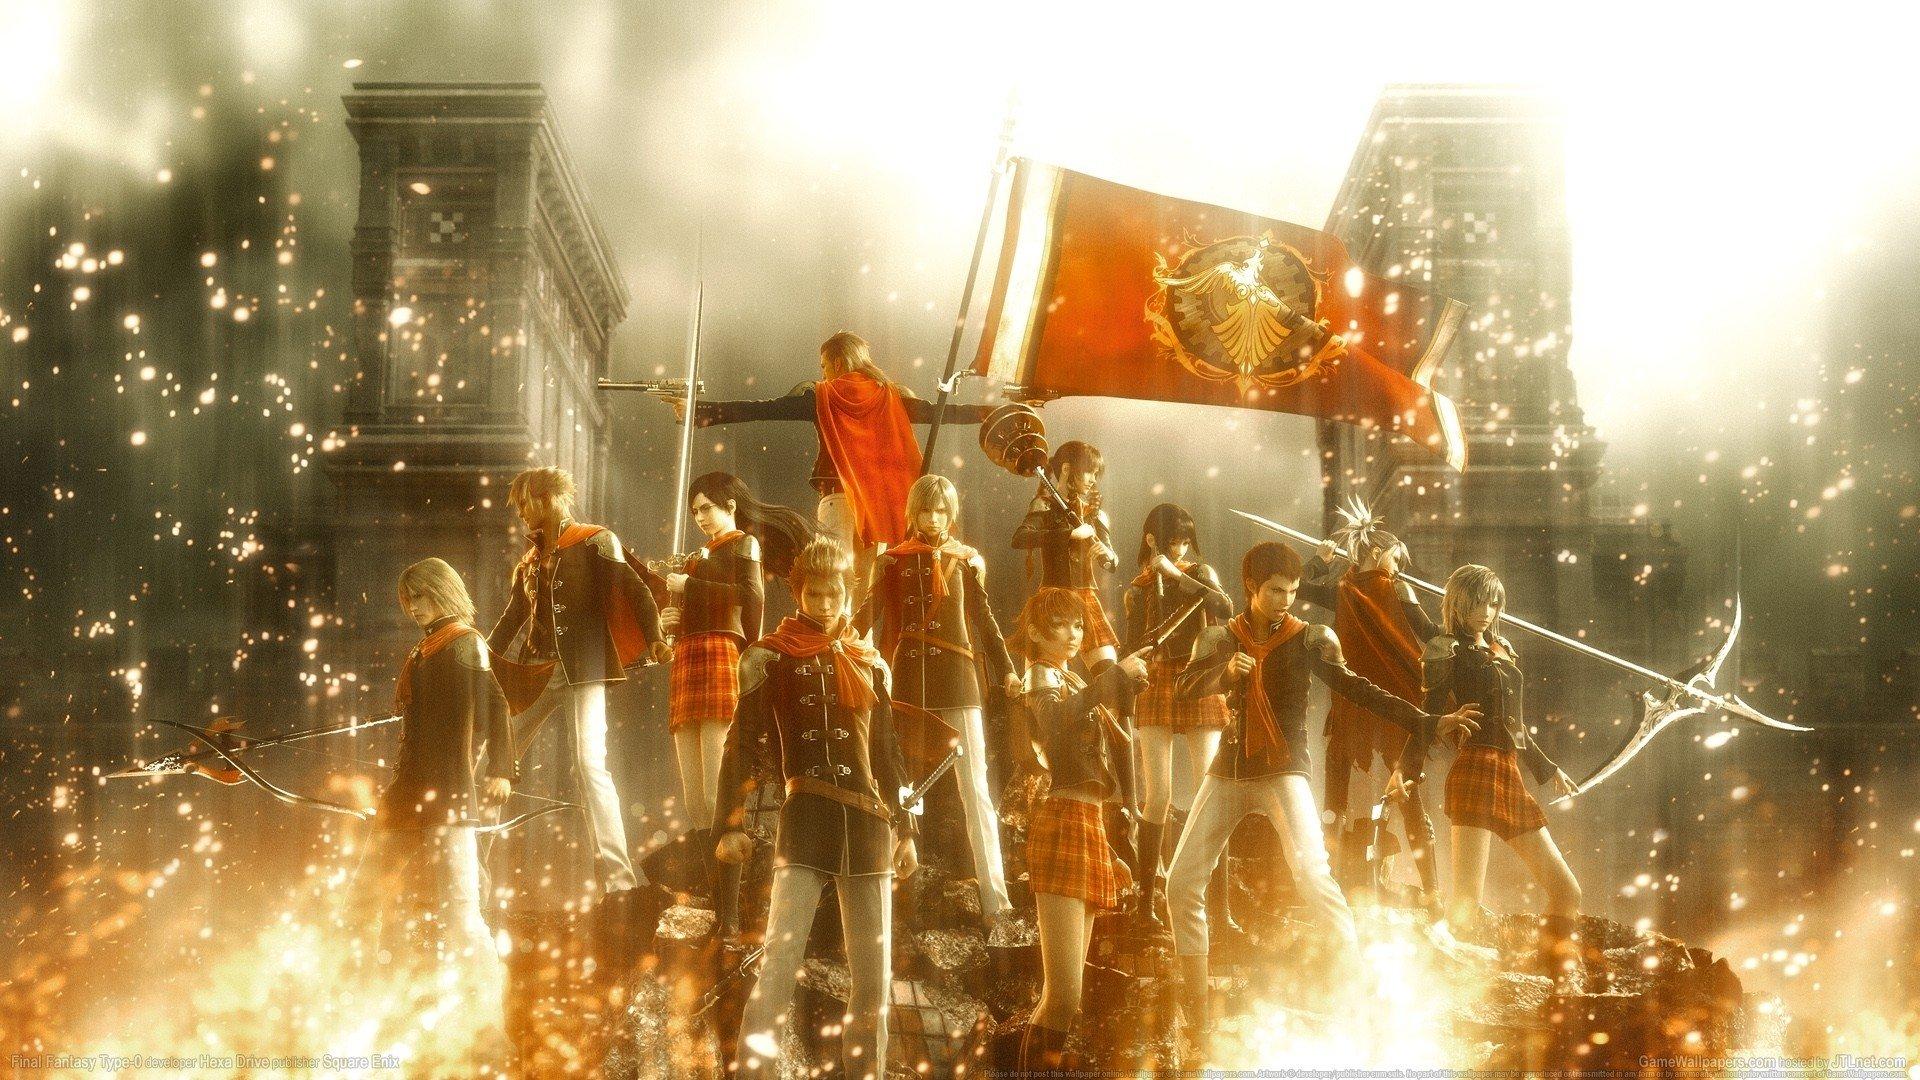 Final Fantasy Type 0 Hd Fondo De Pantalla Hd Fondo De